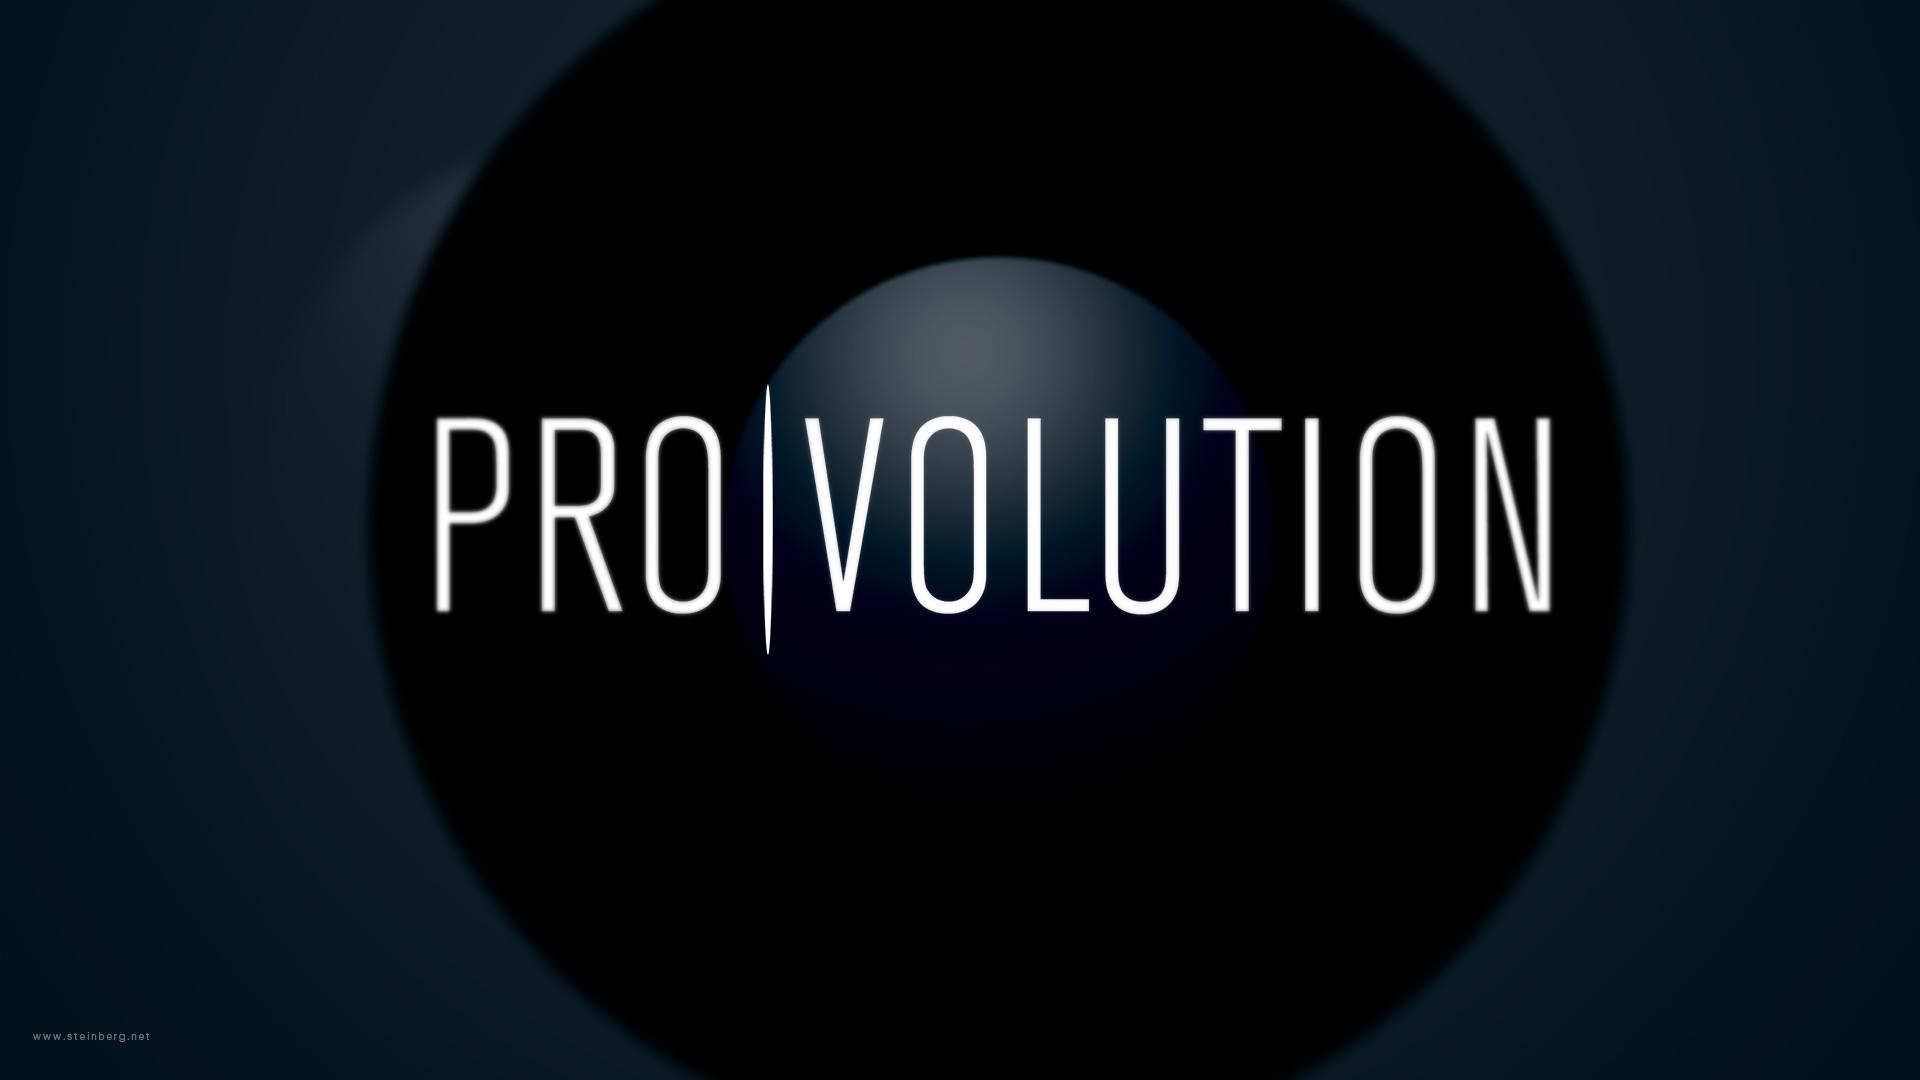 PROVOLUTION_1920x1080